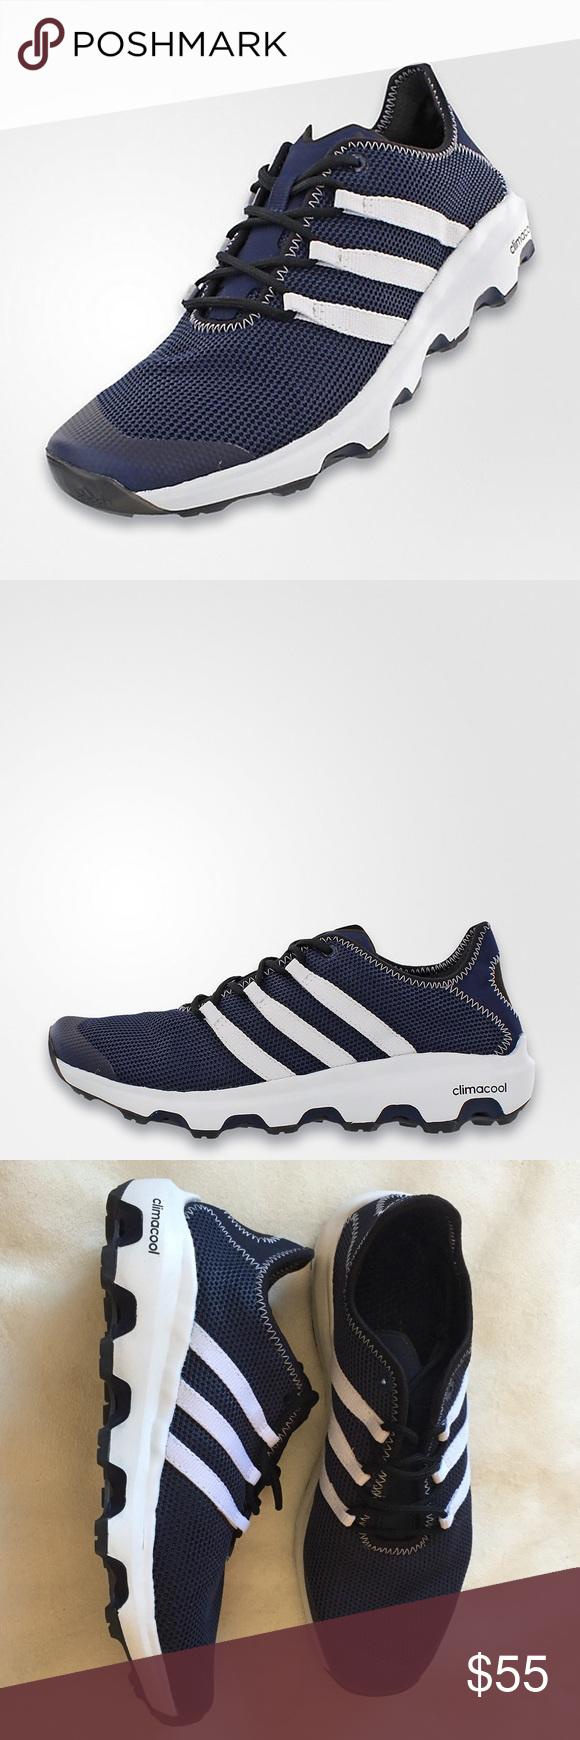 Zapatillas Adidas azul Climacool hombre Voyager para hombre marino en azul marino Adidas Climacool e87b1a6 - antibiotikaamning.website